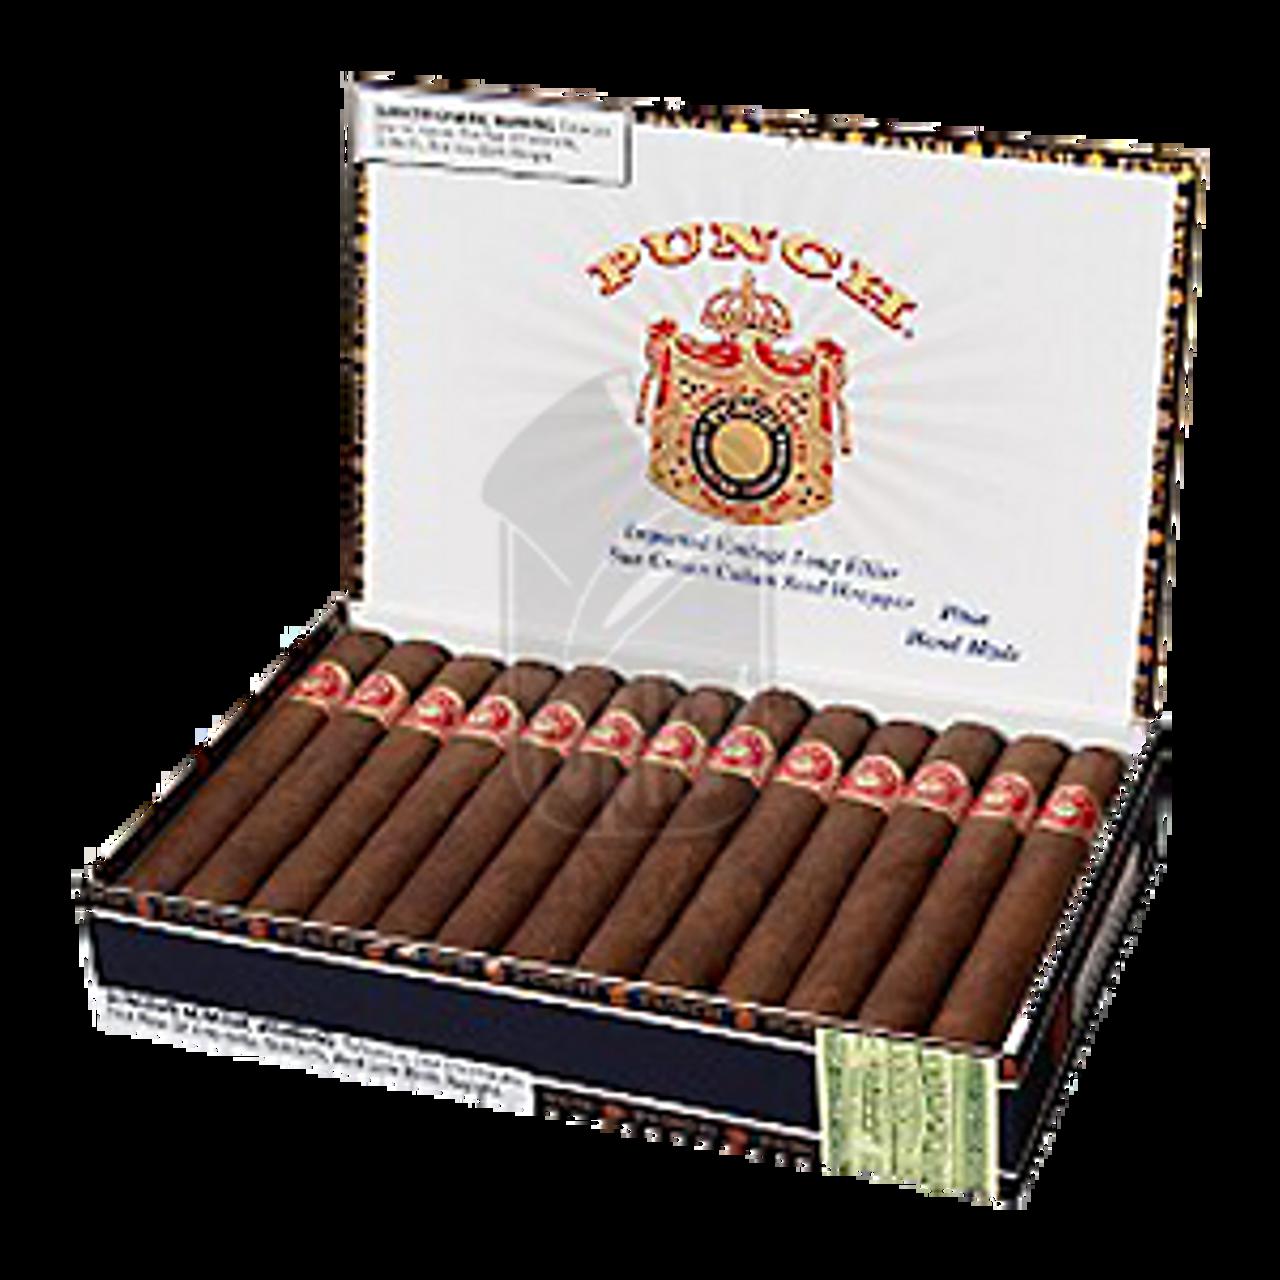 Punch Rothschild Cigars - 4 1/2 x 50 (Box of 50)